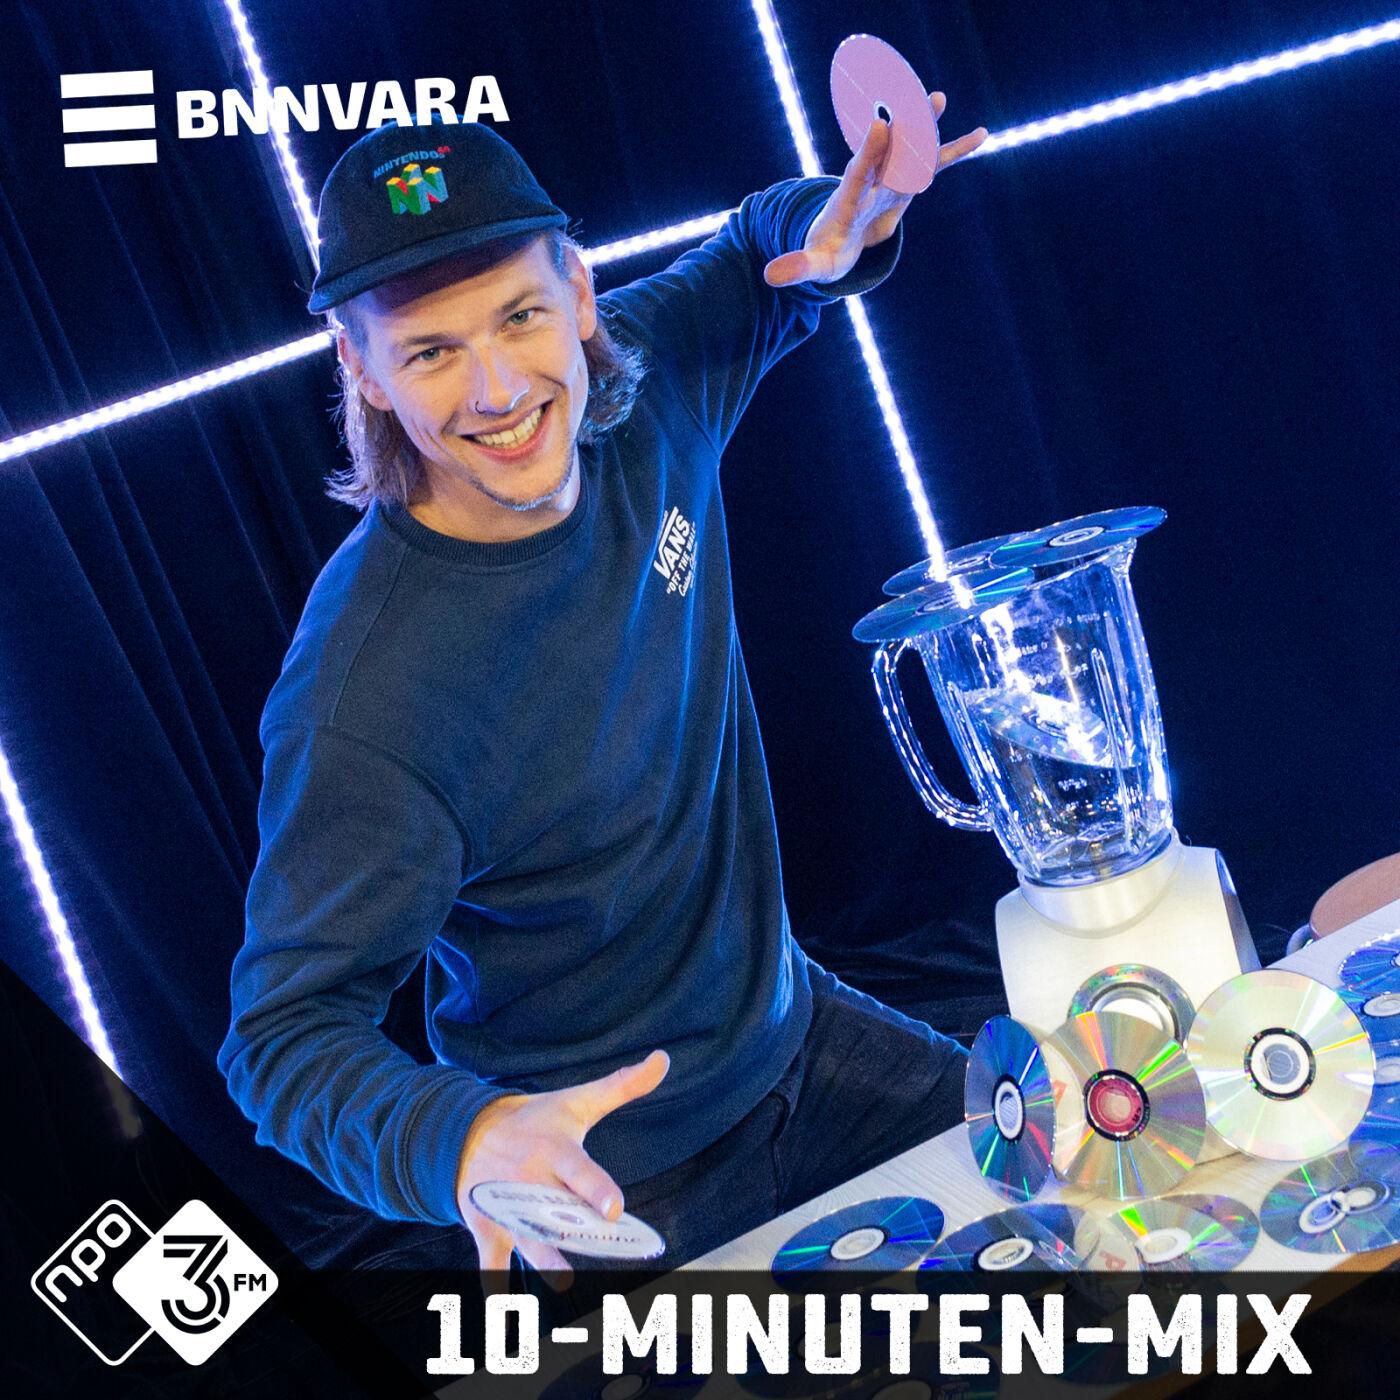 10-Minuten-Mix logo